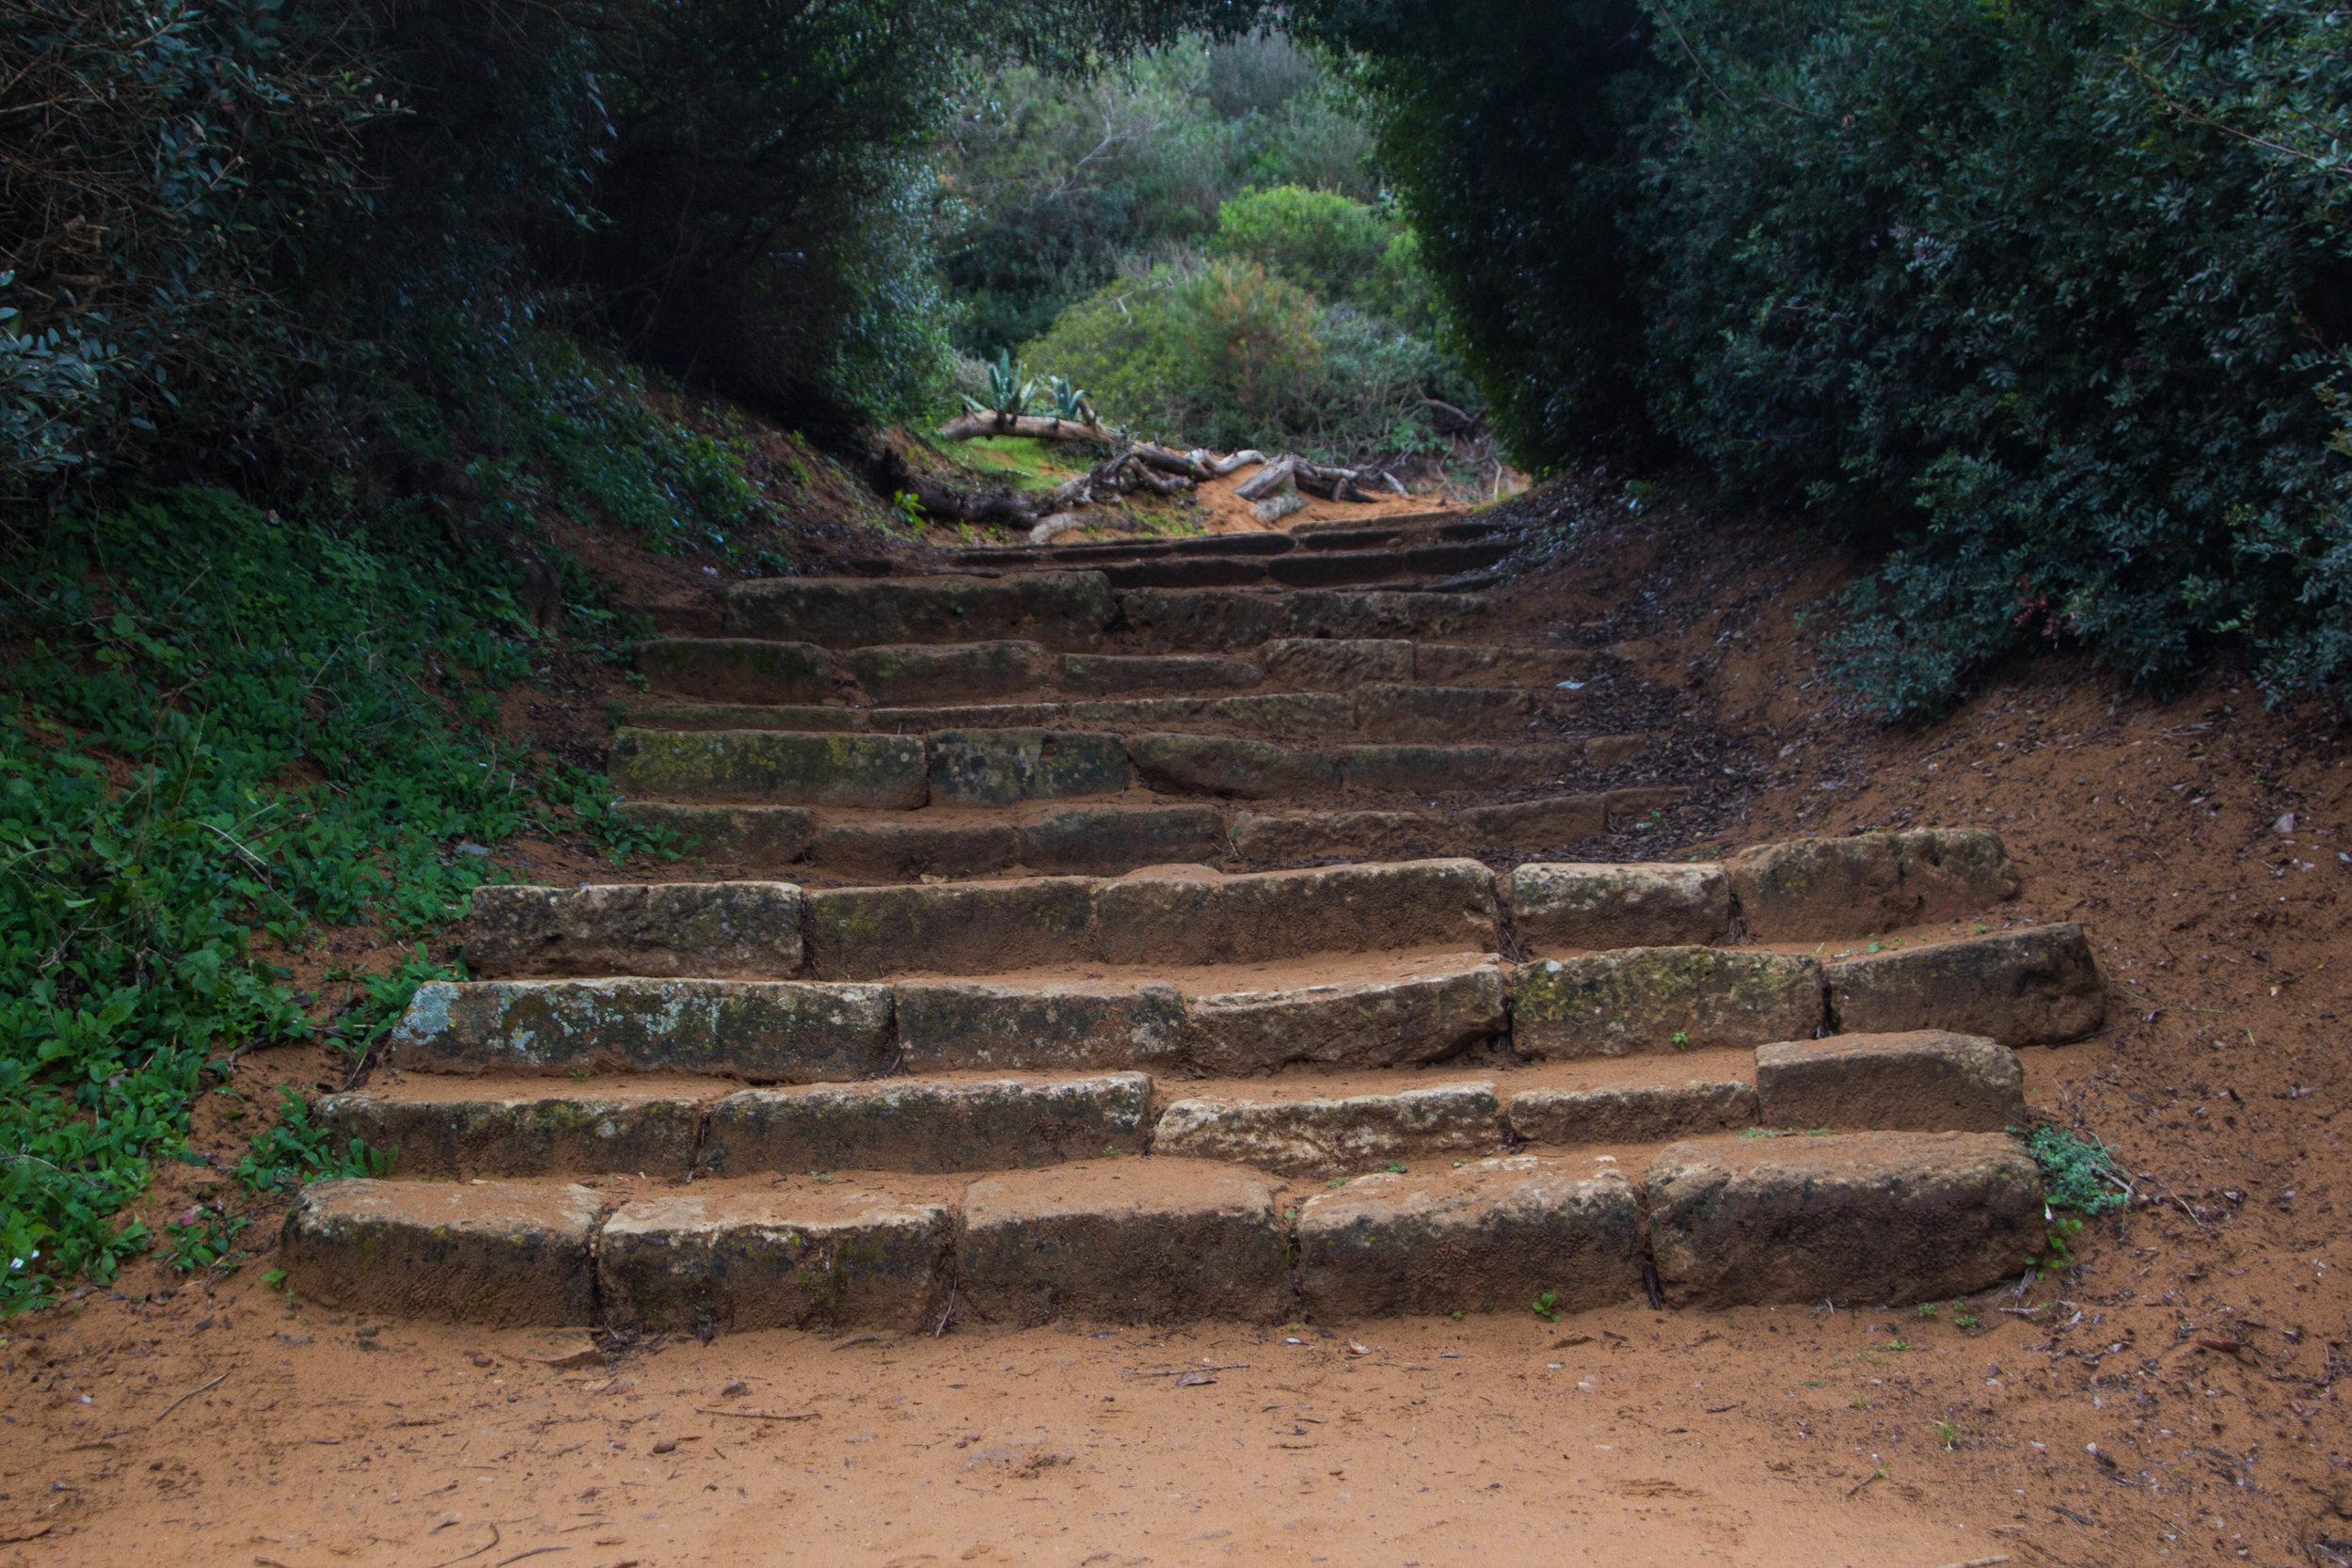 tipiza-roman-ruins-algeria-22.jpg